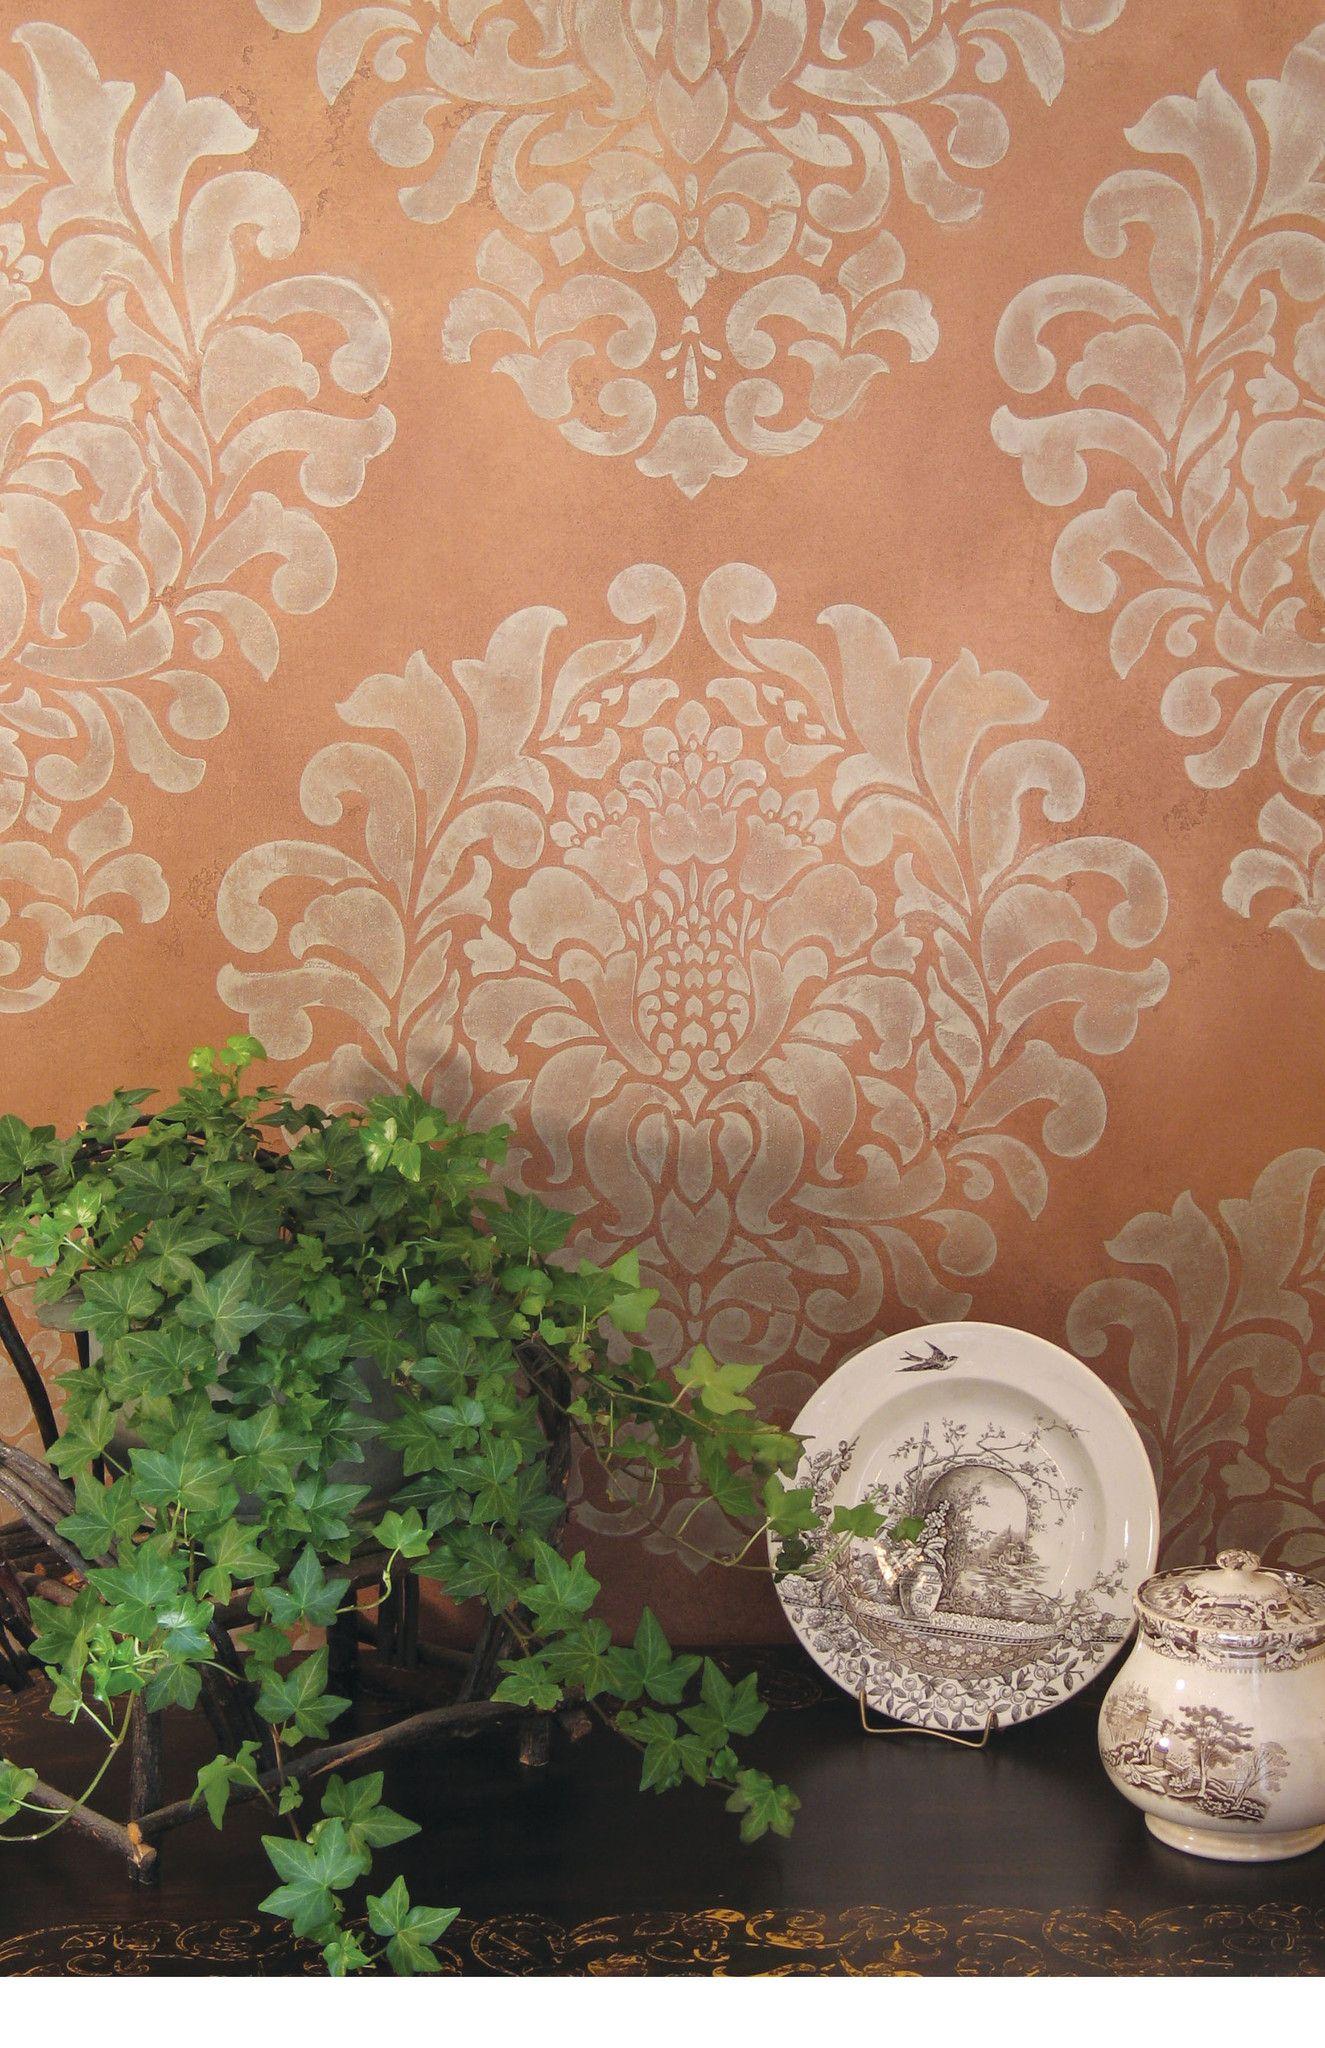 Grand damask wall stencil damask wall stencils damask wall and large trellis wall stencil acanthus damask wall stencil for diy wallpaper royal design studio amipublicfo Images